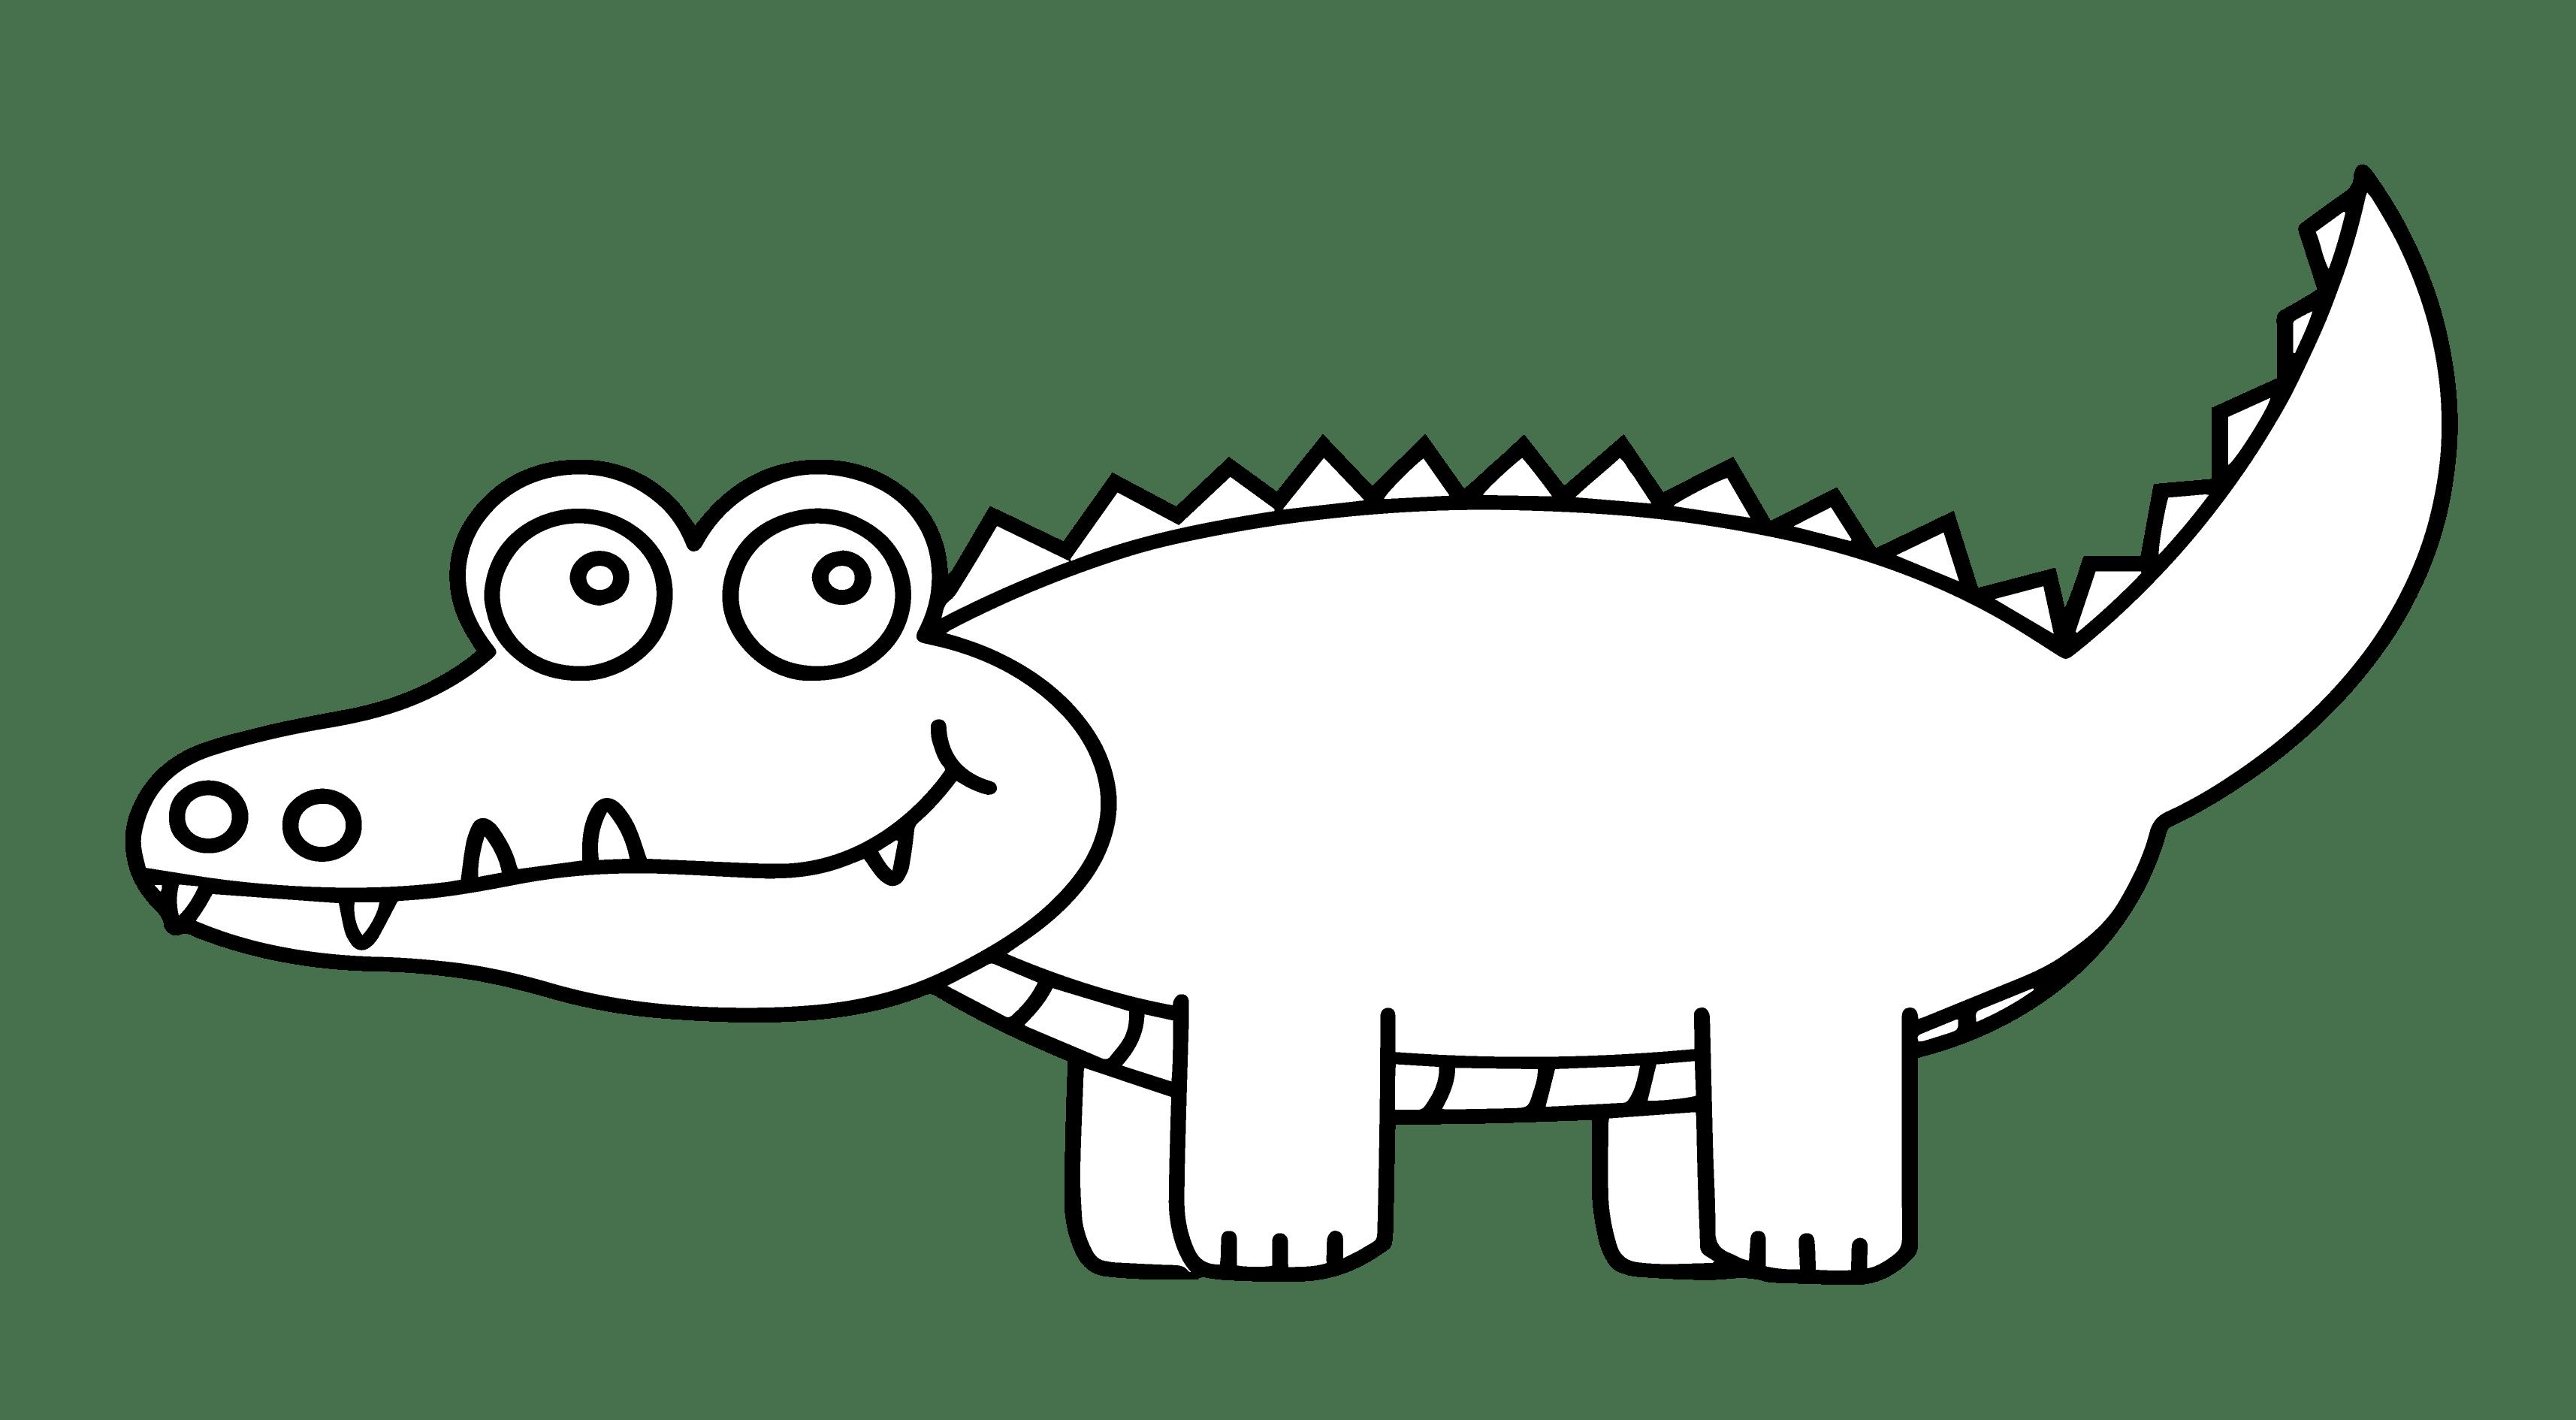 Clipart Alligator Simple Clipart Alligator Simple